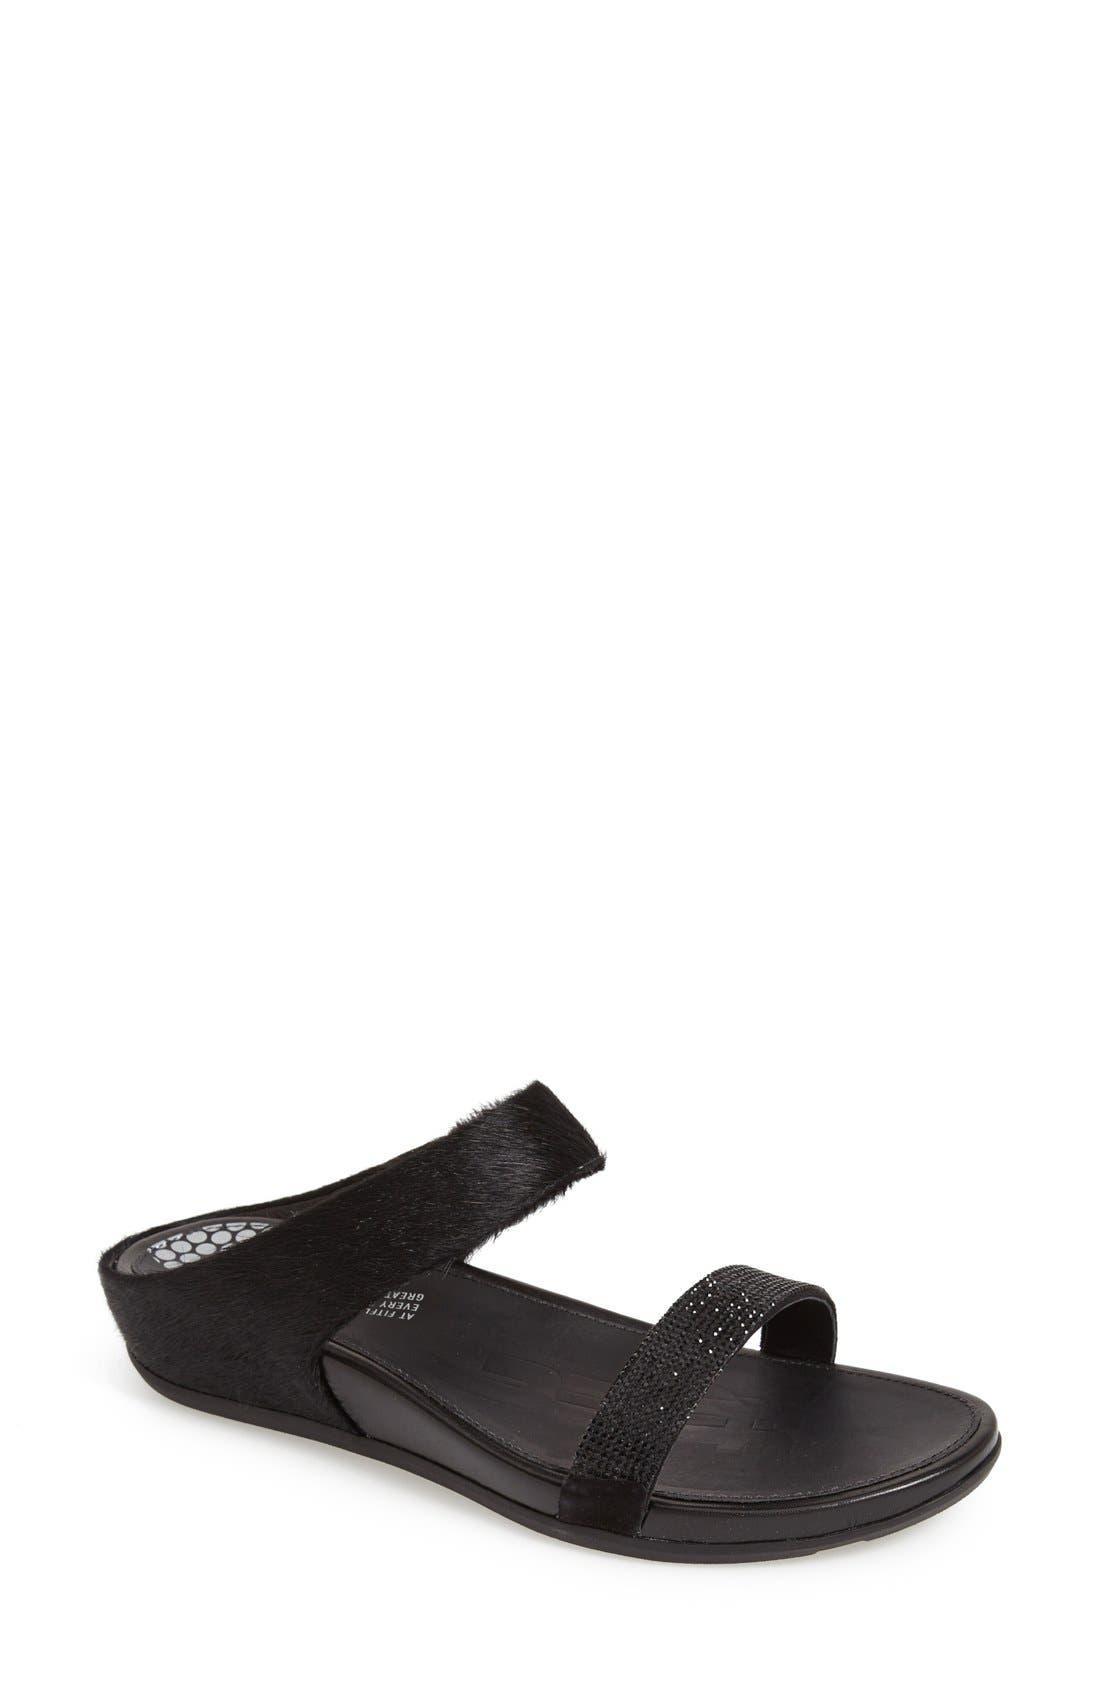 Alternate Image 1 Selected - FitFlop™ 'Banda' Slide Sandal (Women)